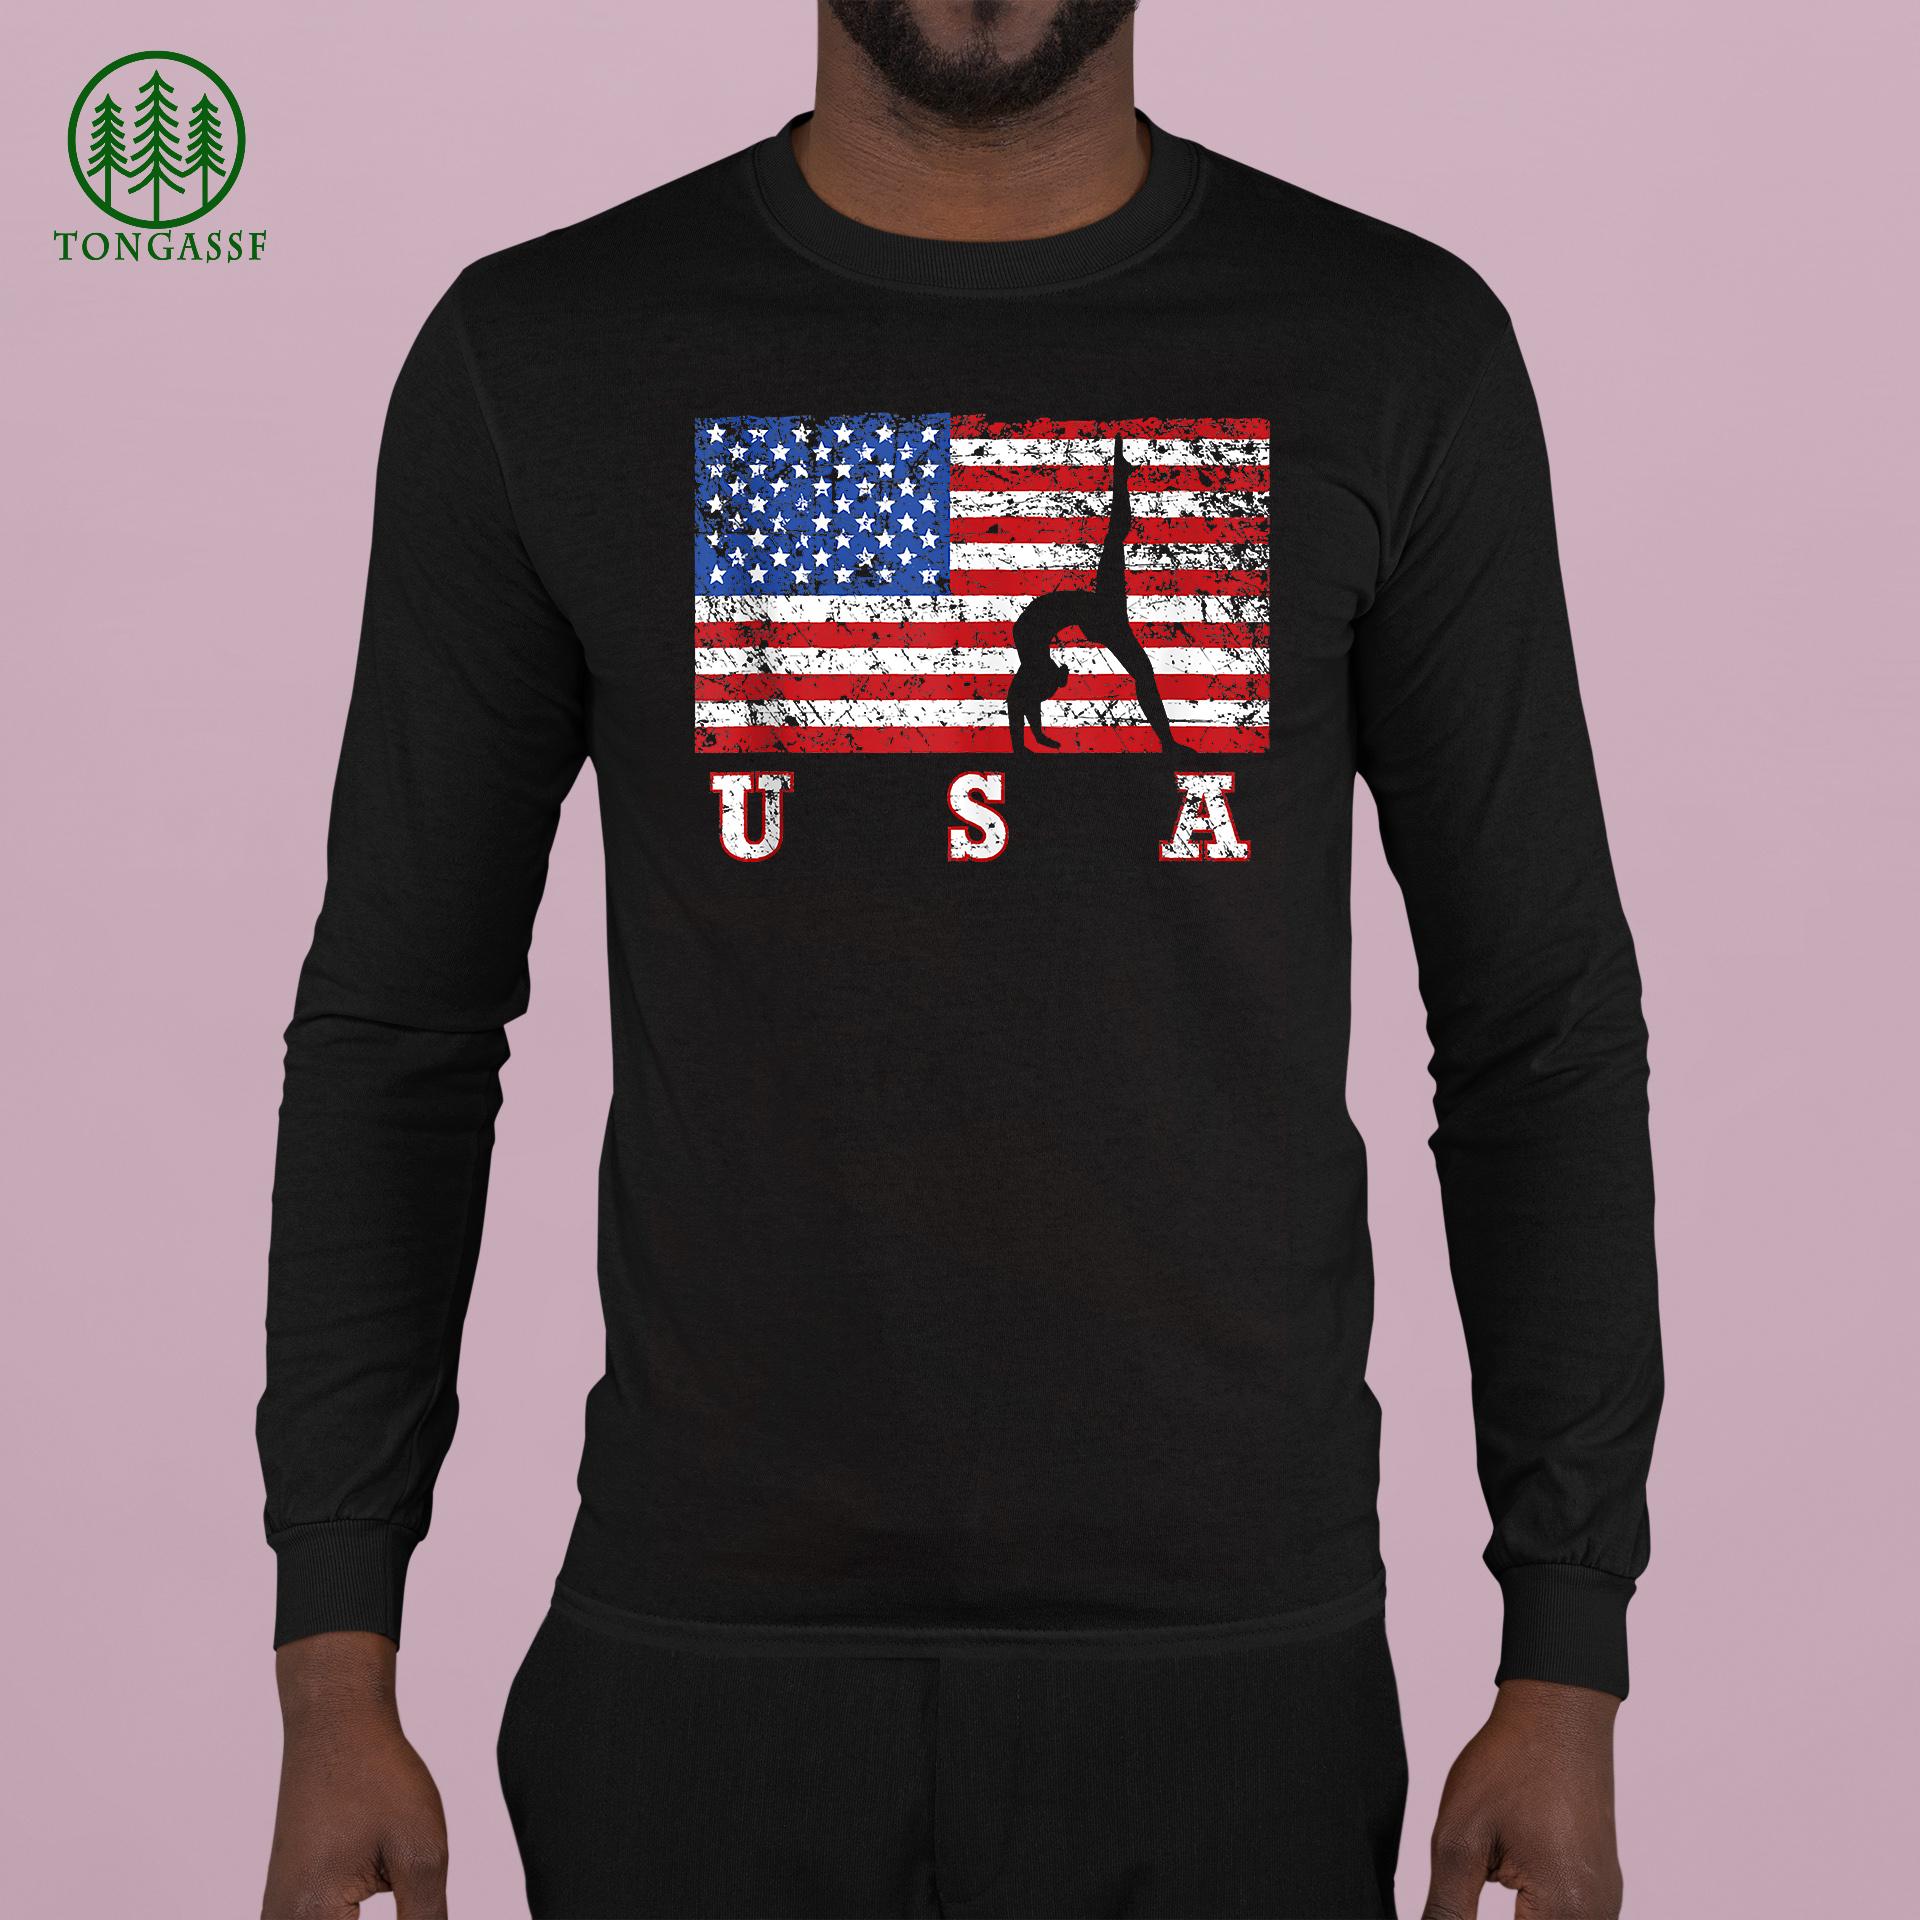 American Flag Gymnastics USA Gift Tumbling Team Longsleeve Shirt